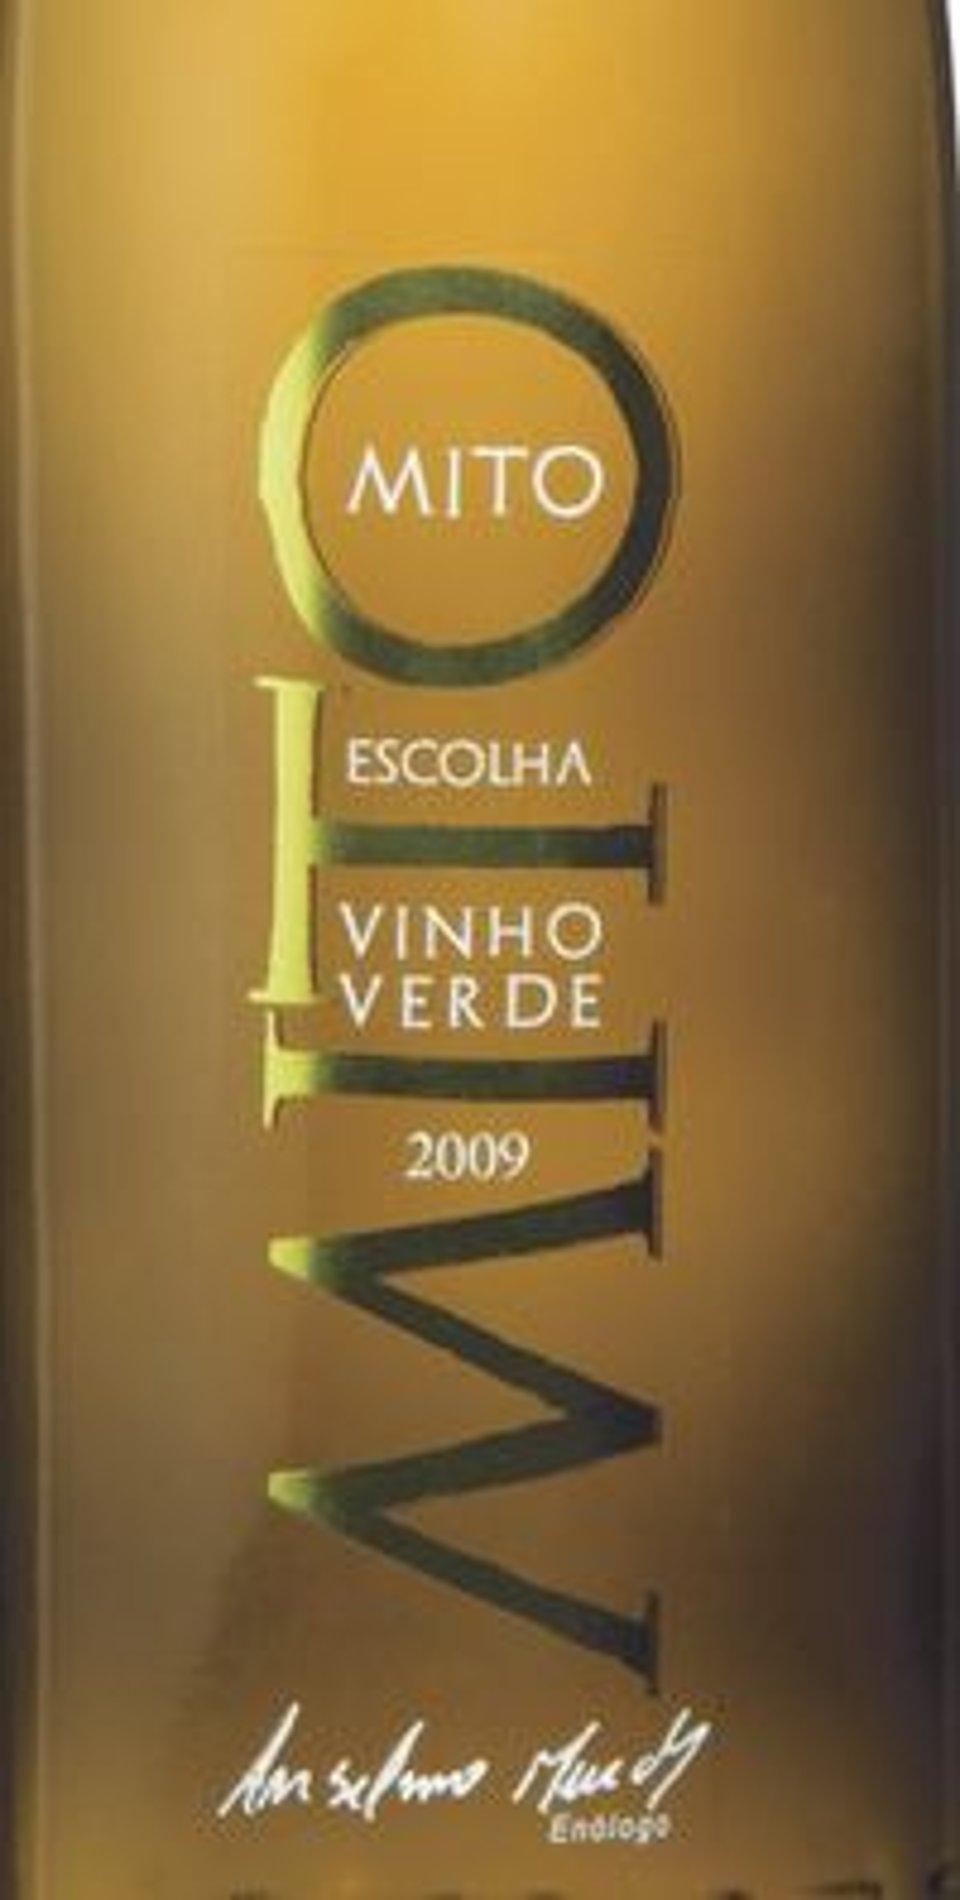 Mito Vinho Verde